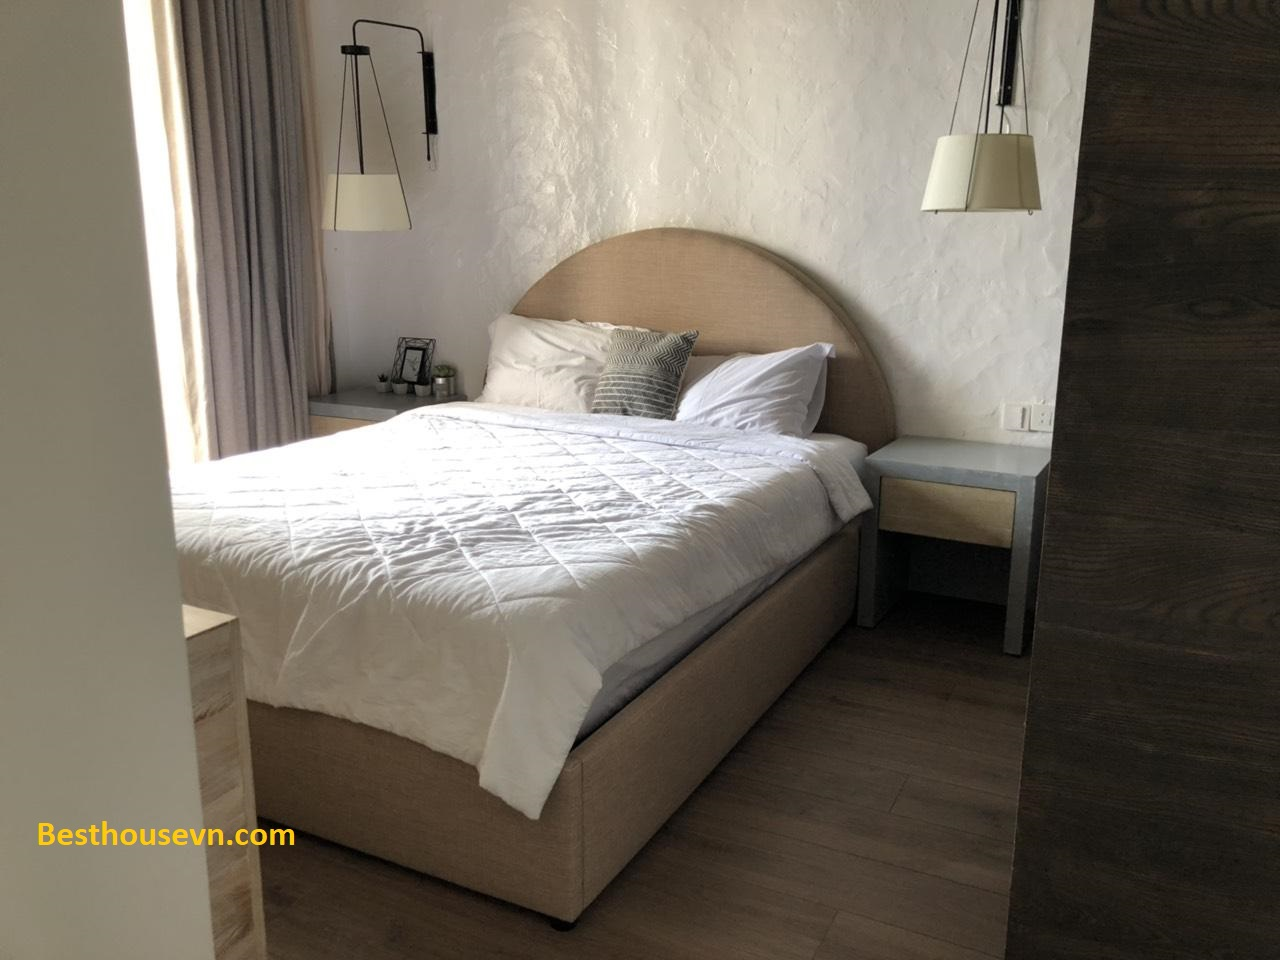 Apartment-for-rent-in-river-park-premier-district -7-3